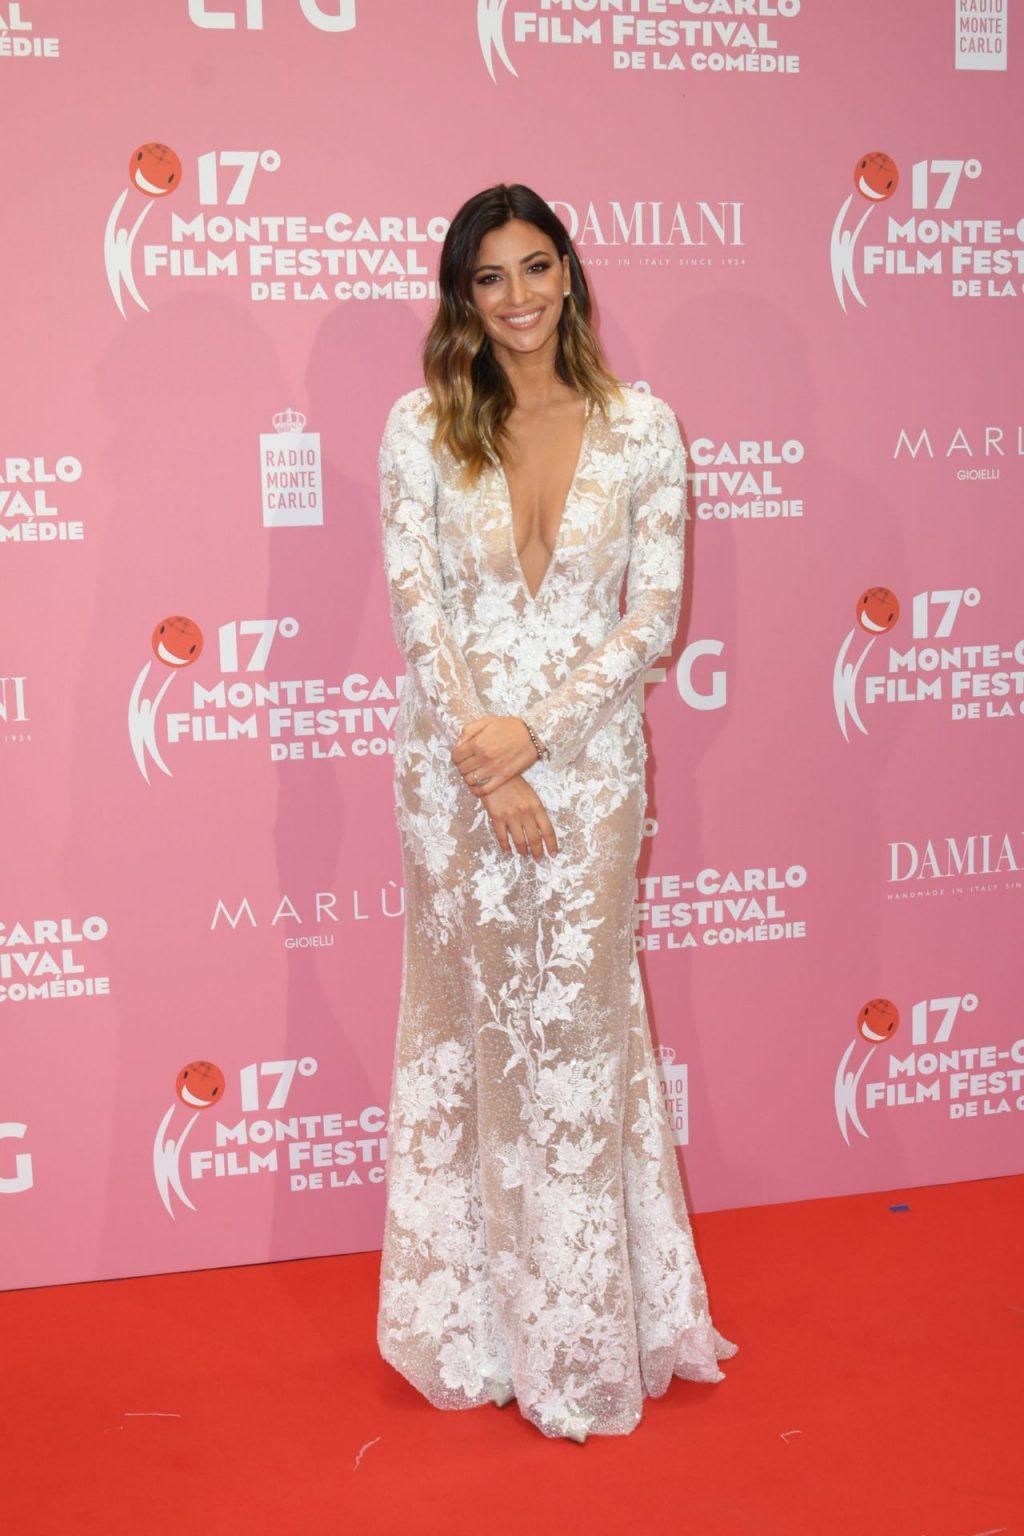 Romina Pierdomenico Shines at the 2020 Monte-Carlo Film Festival (48 Photos + Video)